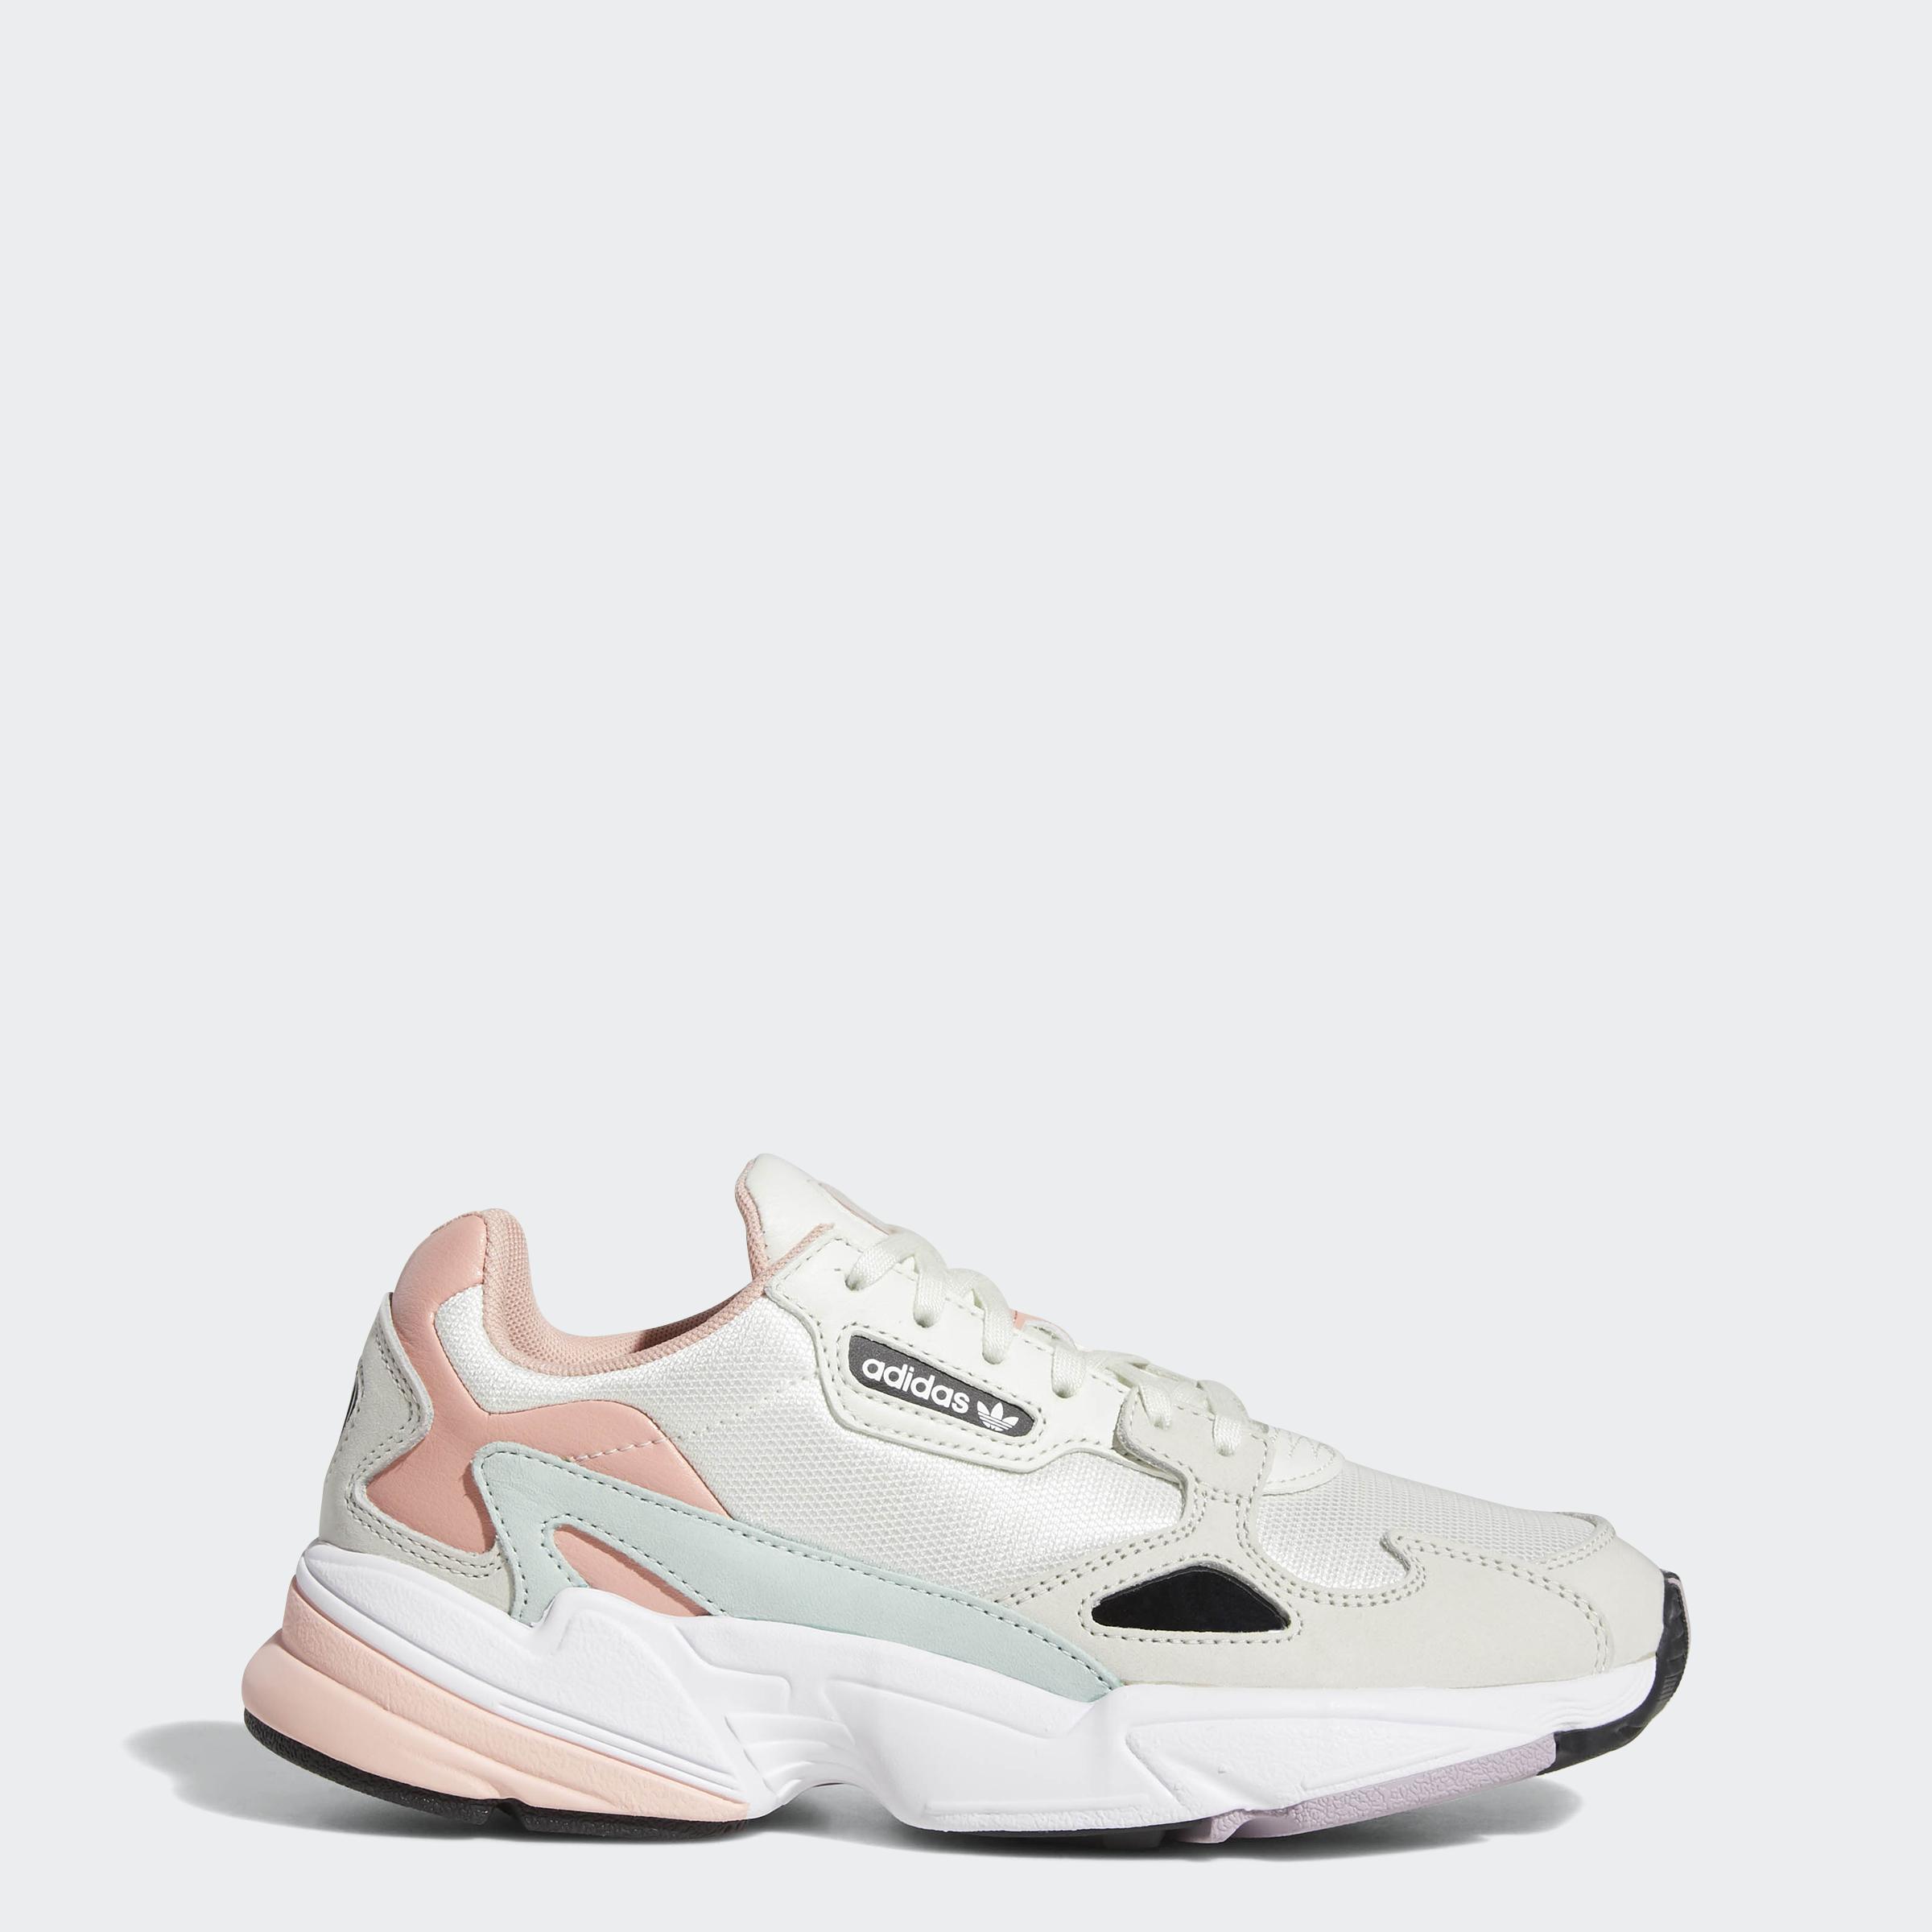 adidas-Originals-Falcon-Shoes-Women-039-s thumbnail 37